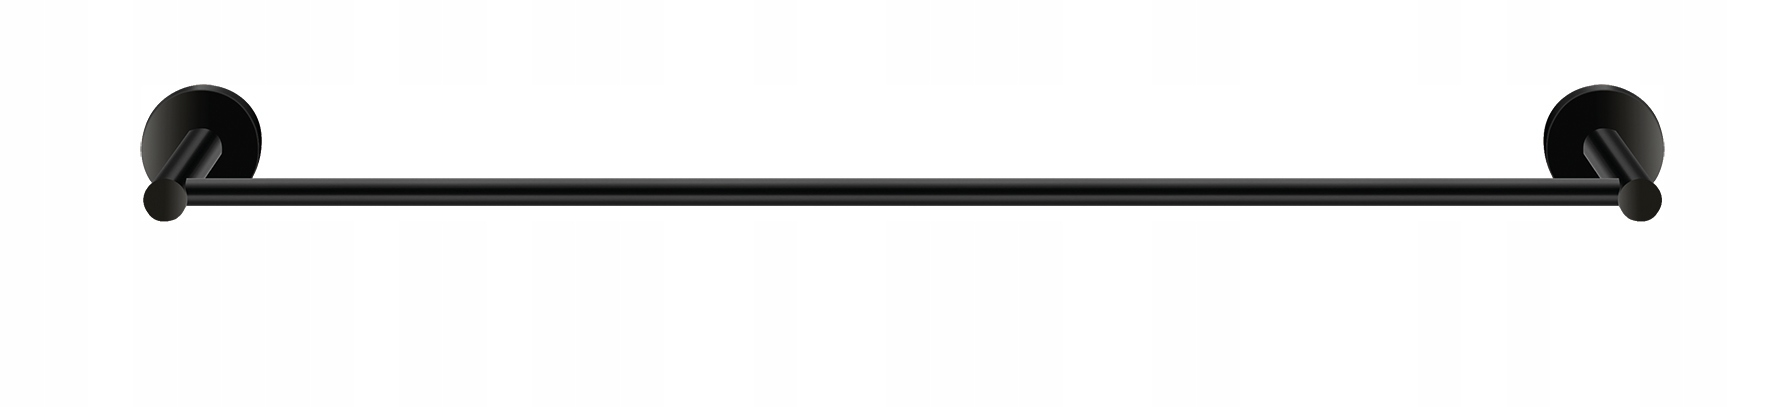 TWIST matné čierne jednoduché zábradlie